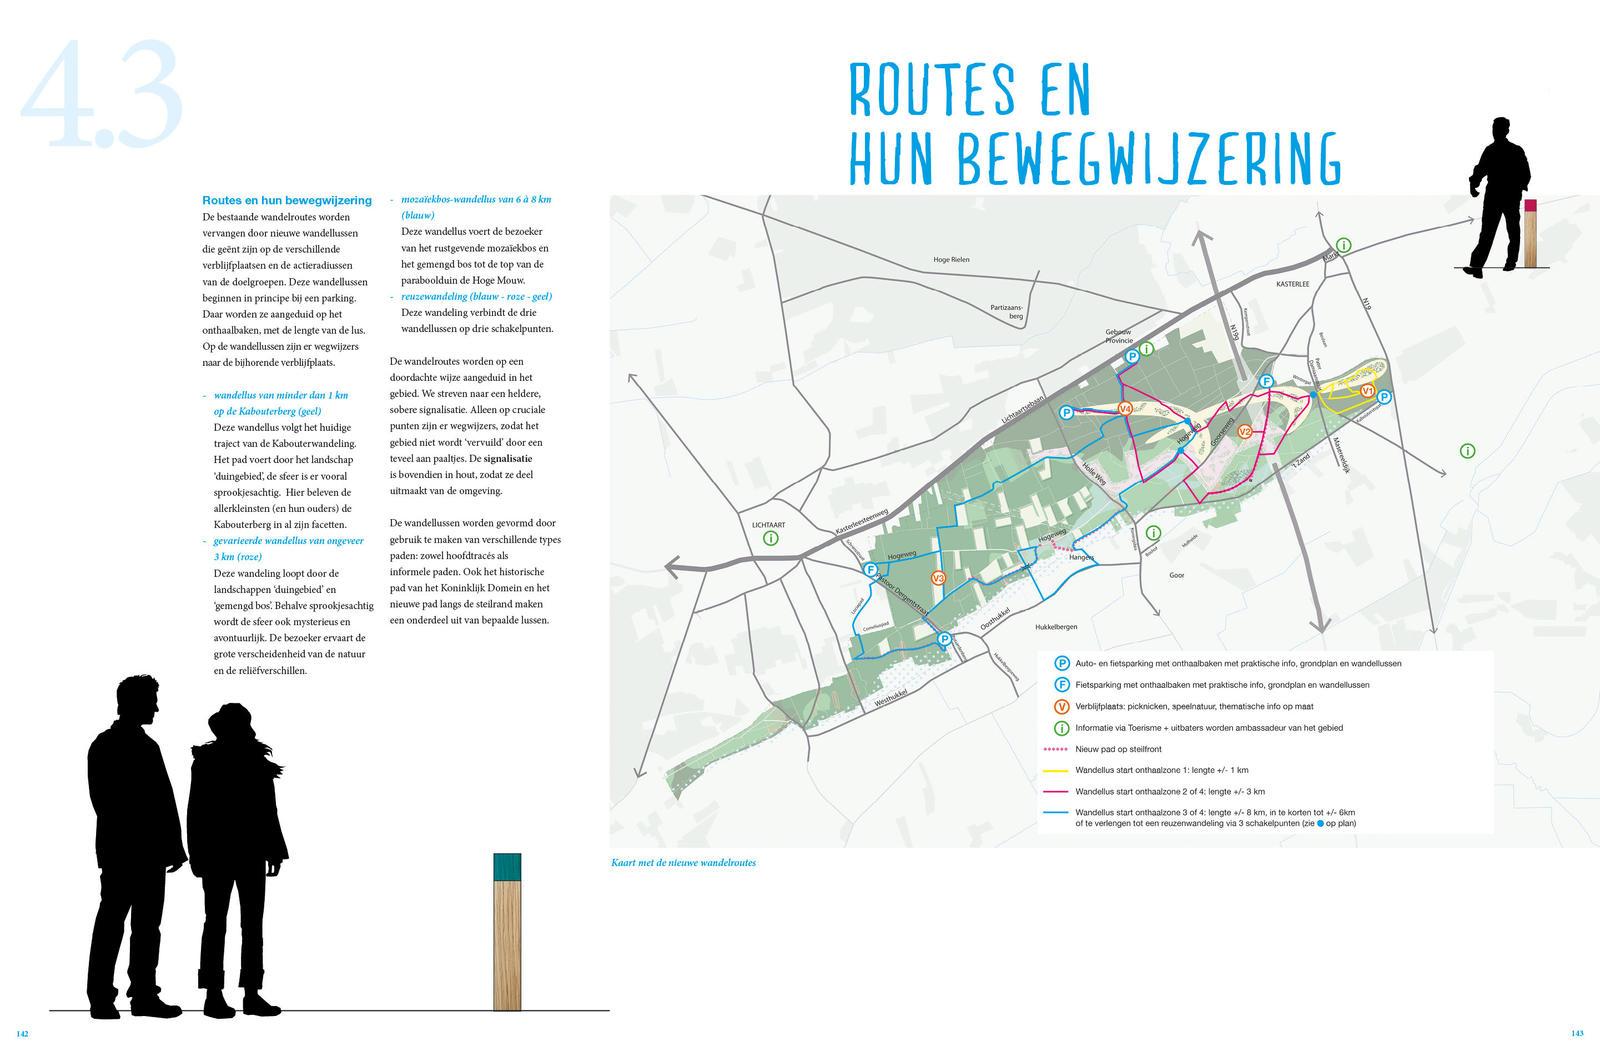 Kempense heuvelrug - spread